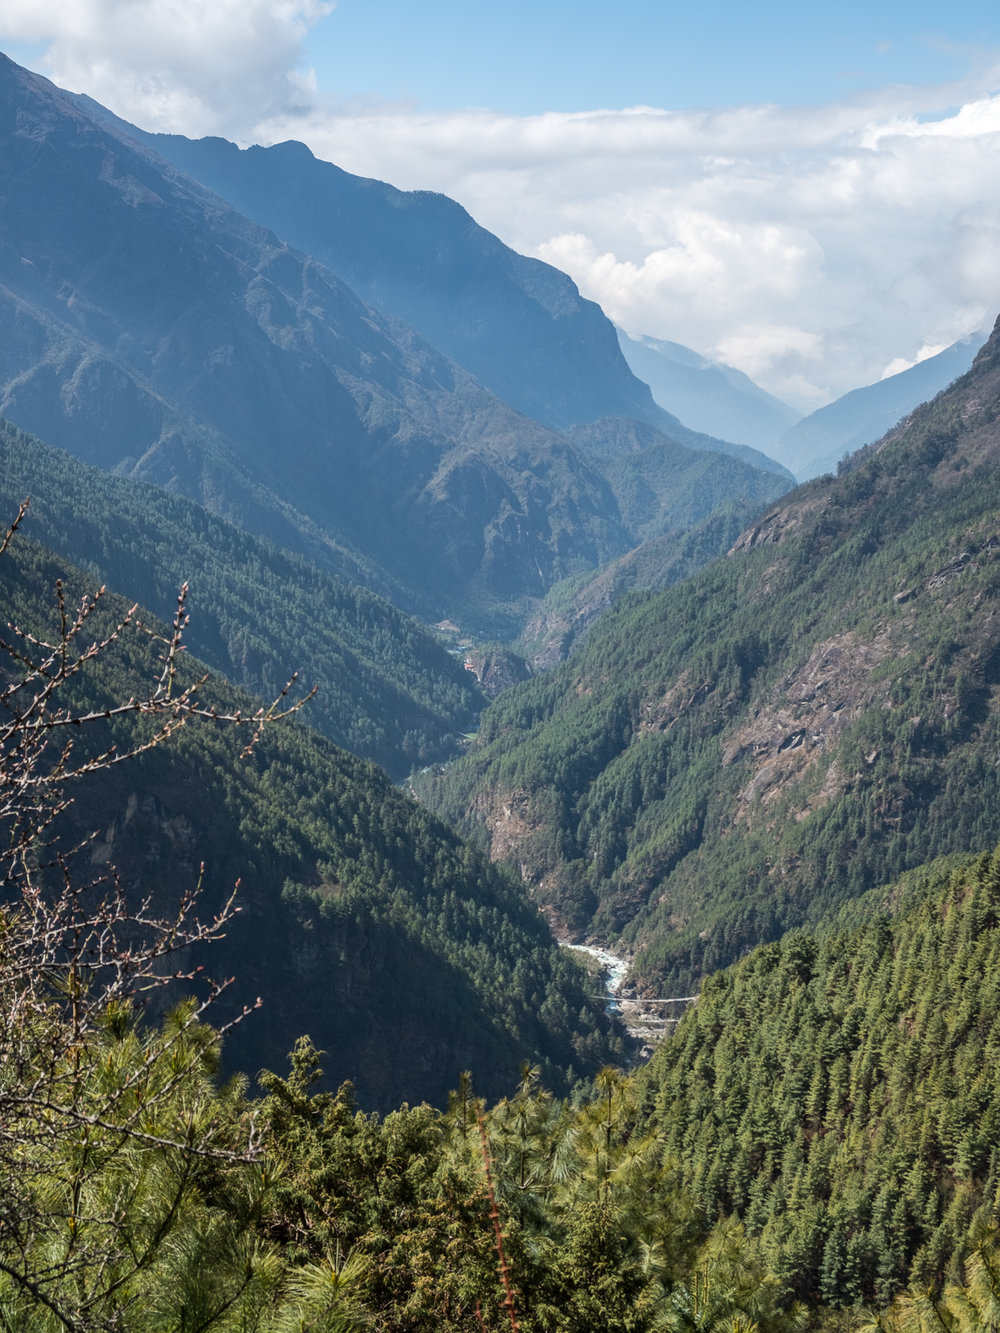 Dudh Kosi River, Nepal.